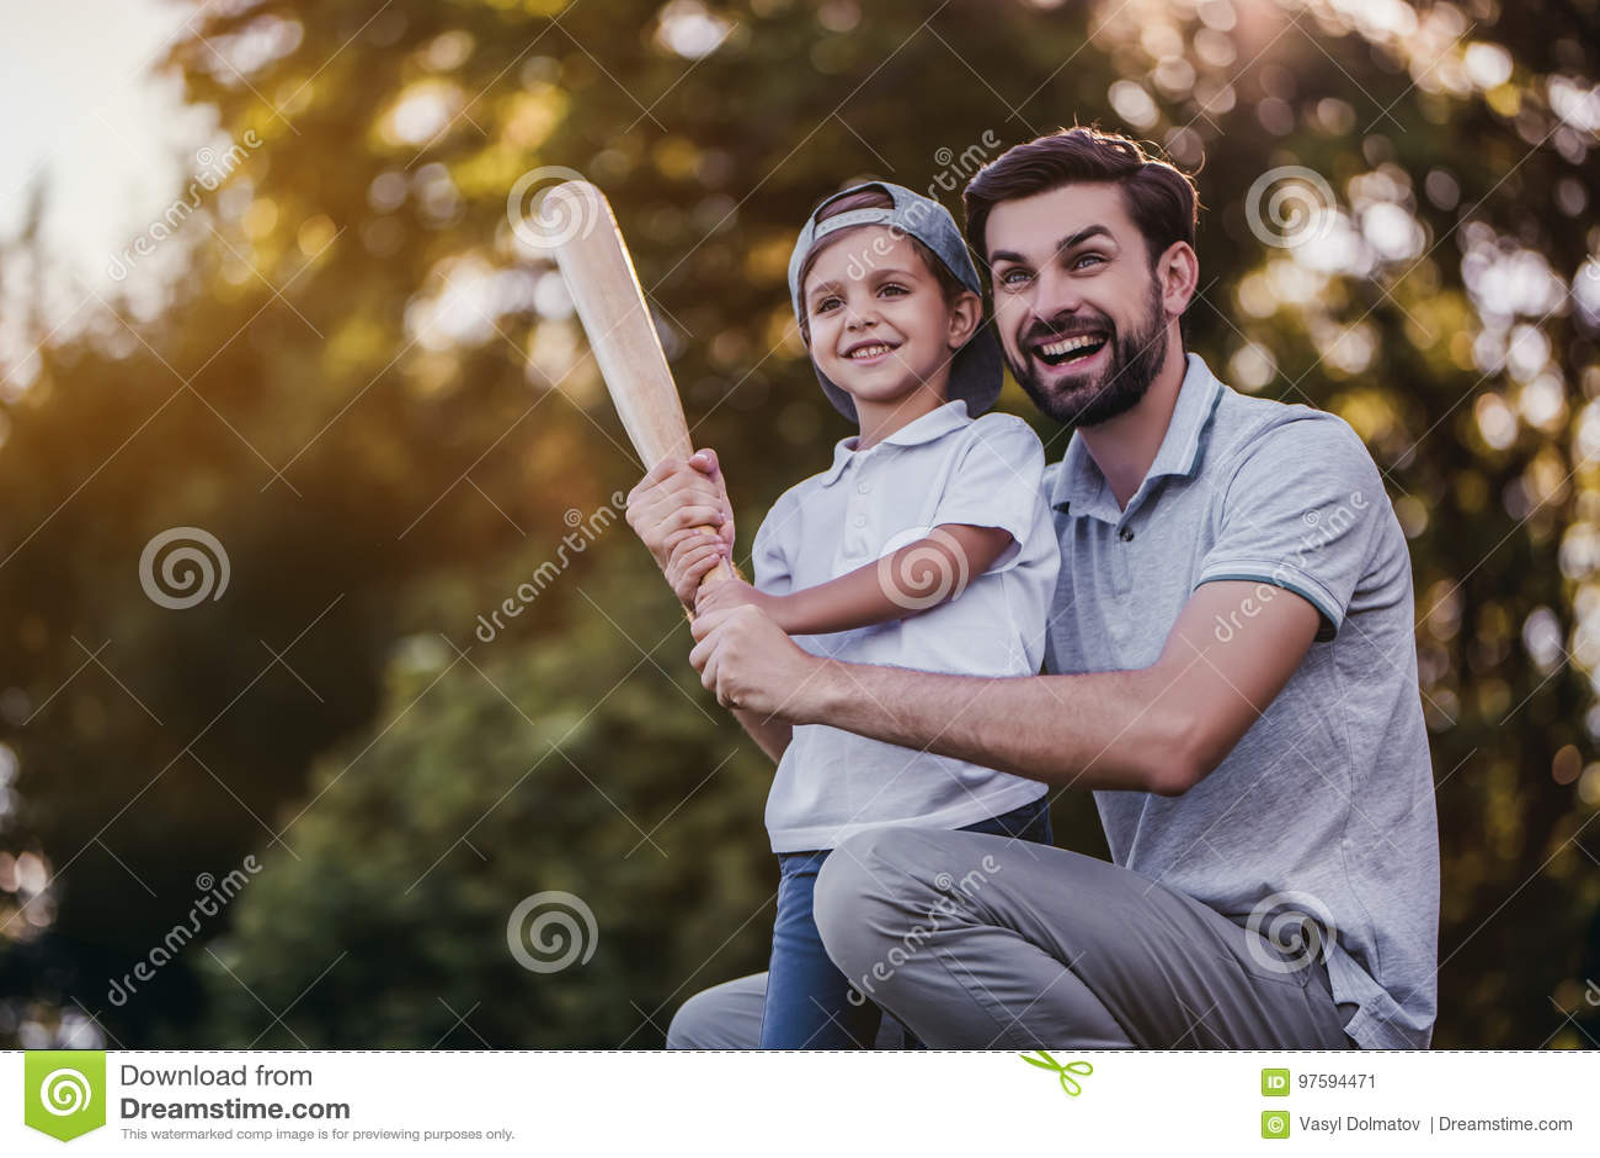 Vati mit dem Sohn, der Baseball spielt